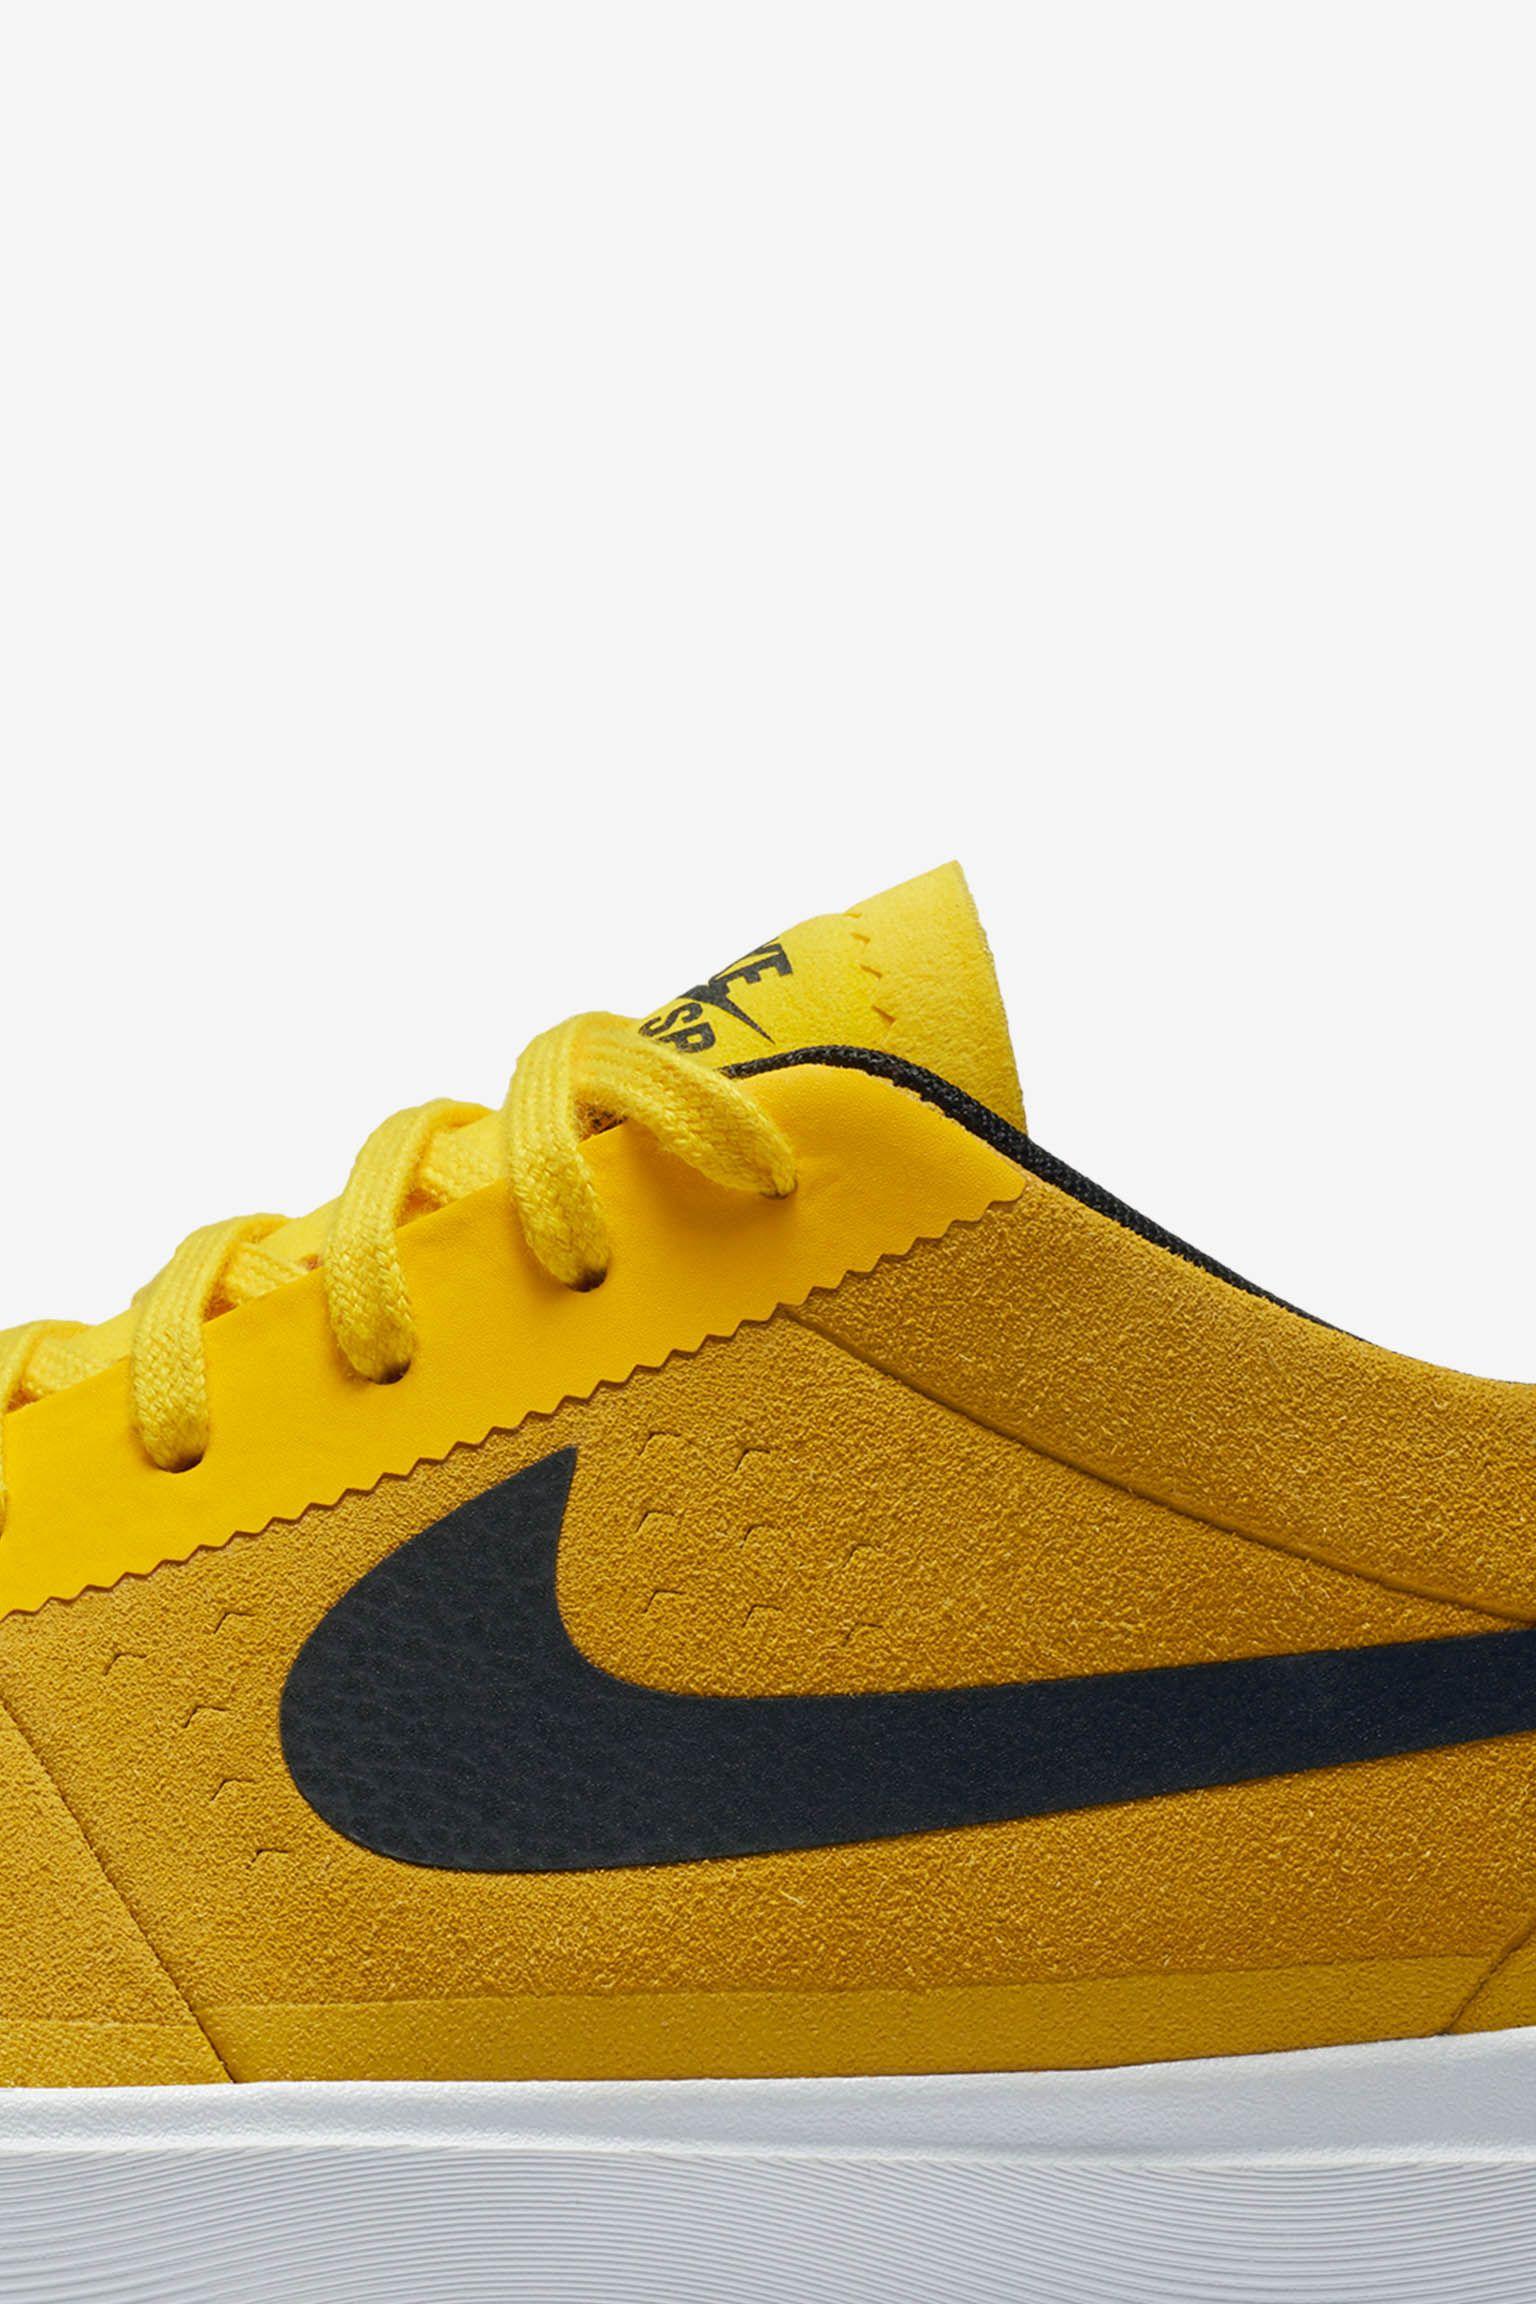 Nike SB Bruin Hyperfeel 'Tour Yellow'